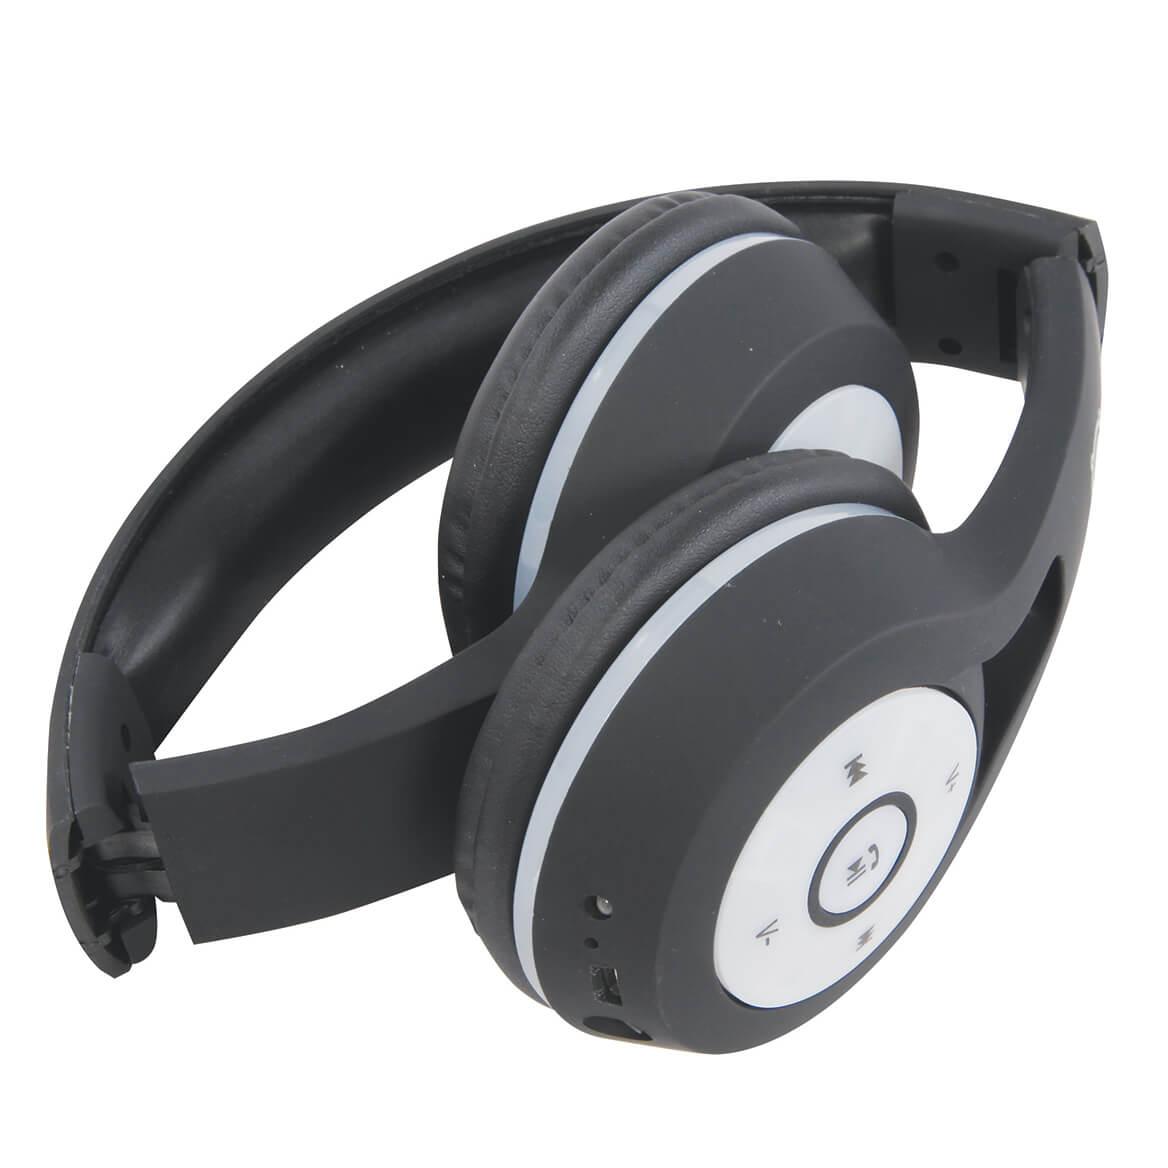 Light-Up Wireless Headphones-369690